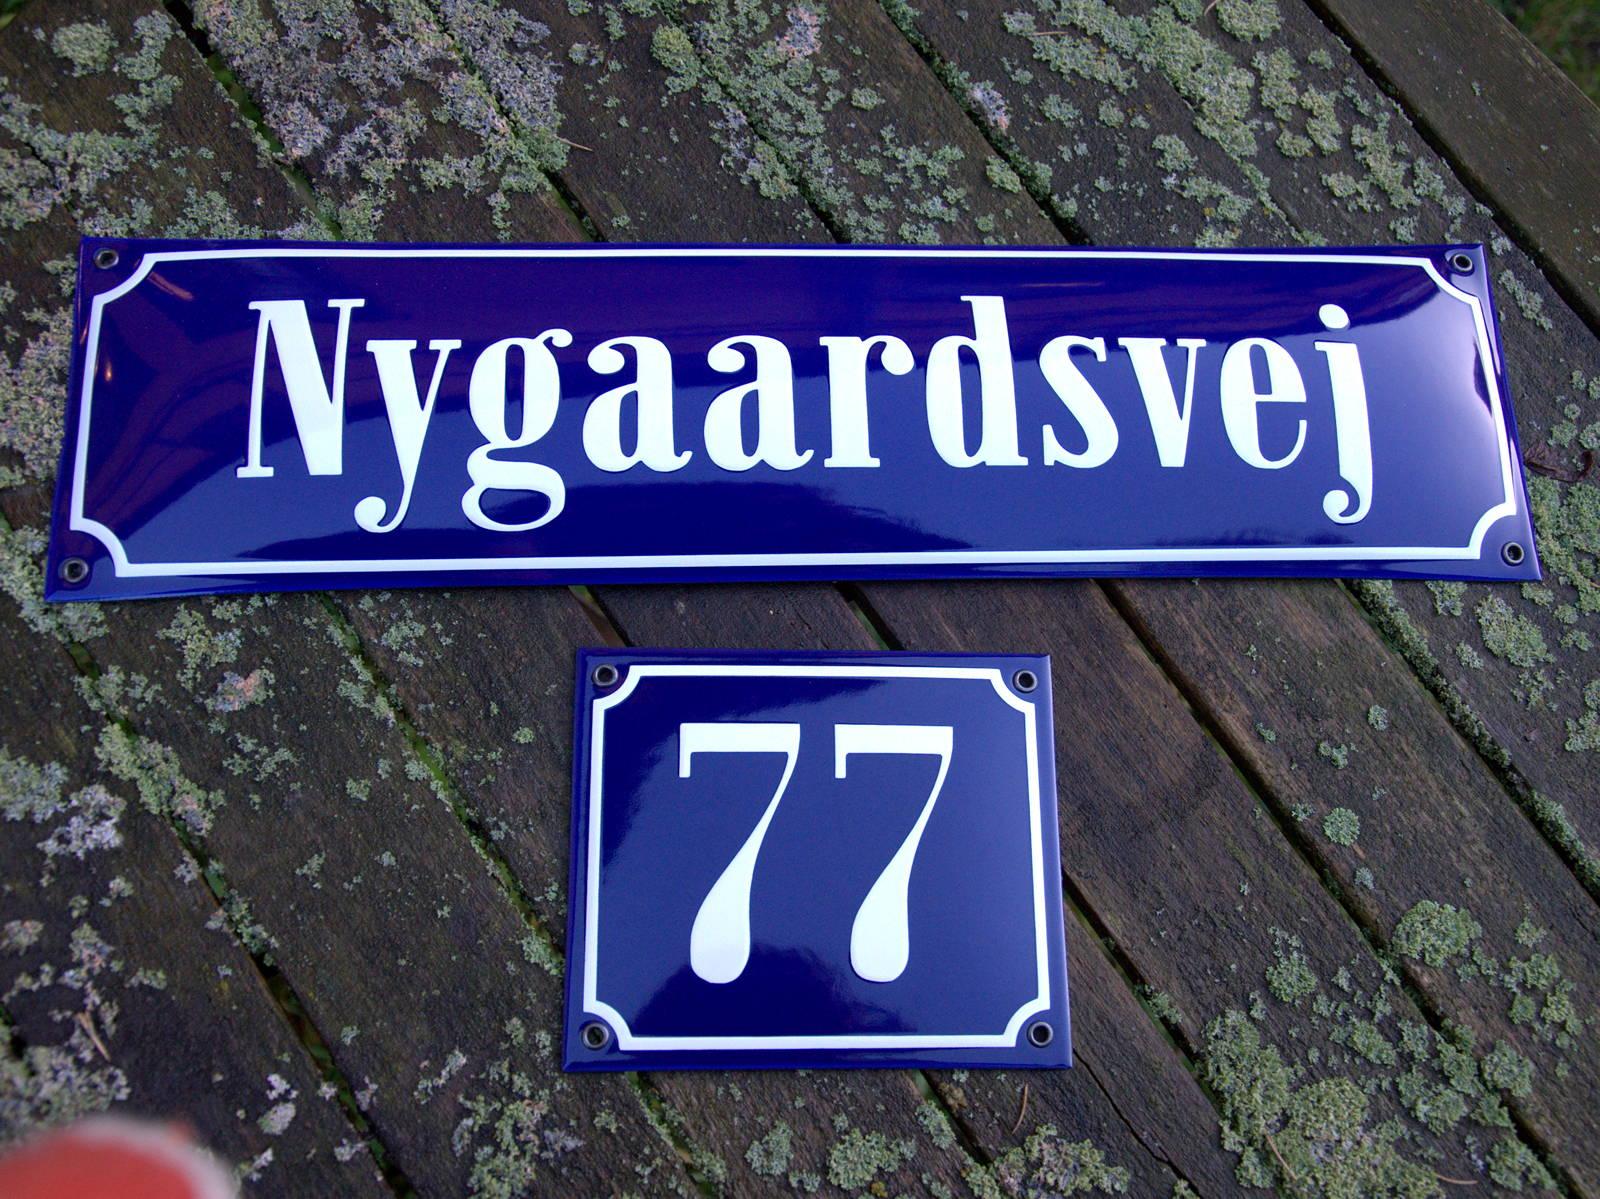 Nygaardsvej-DSC_0513-web1600